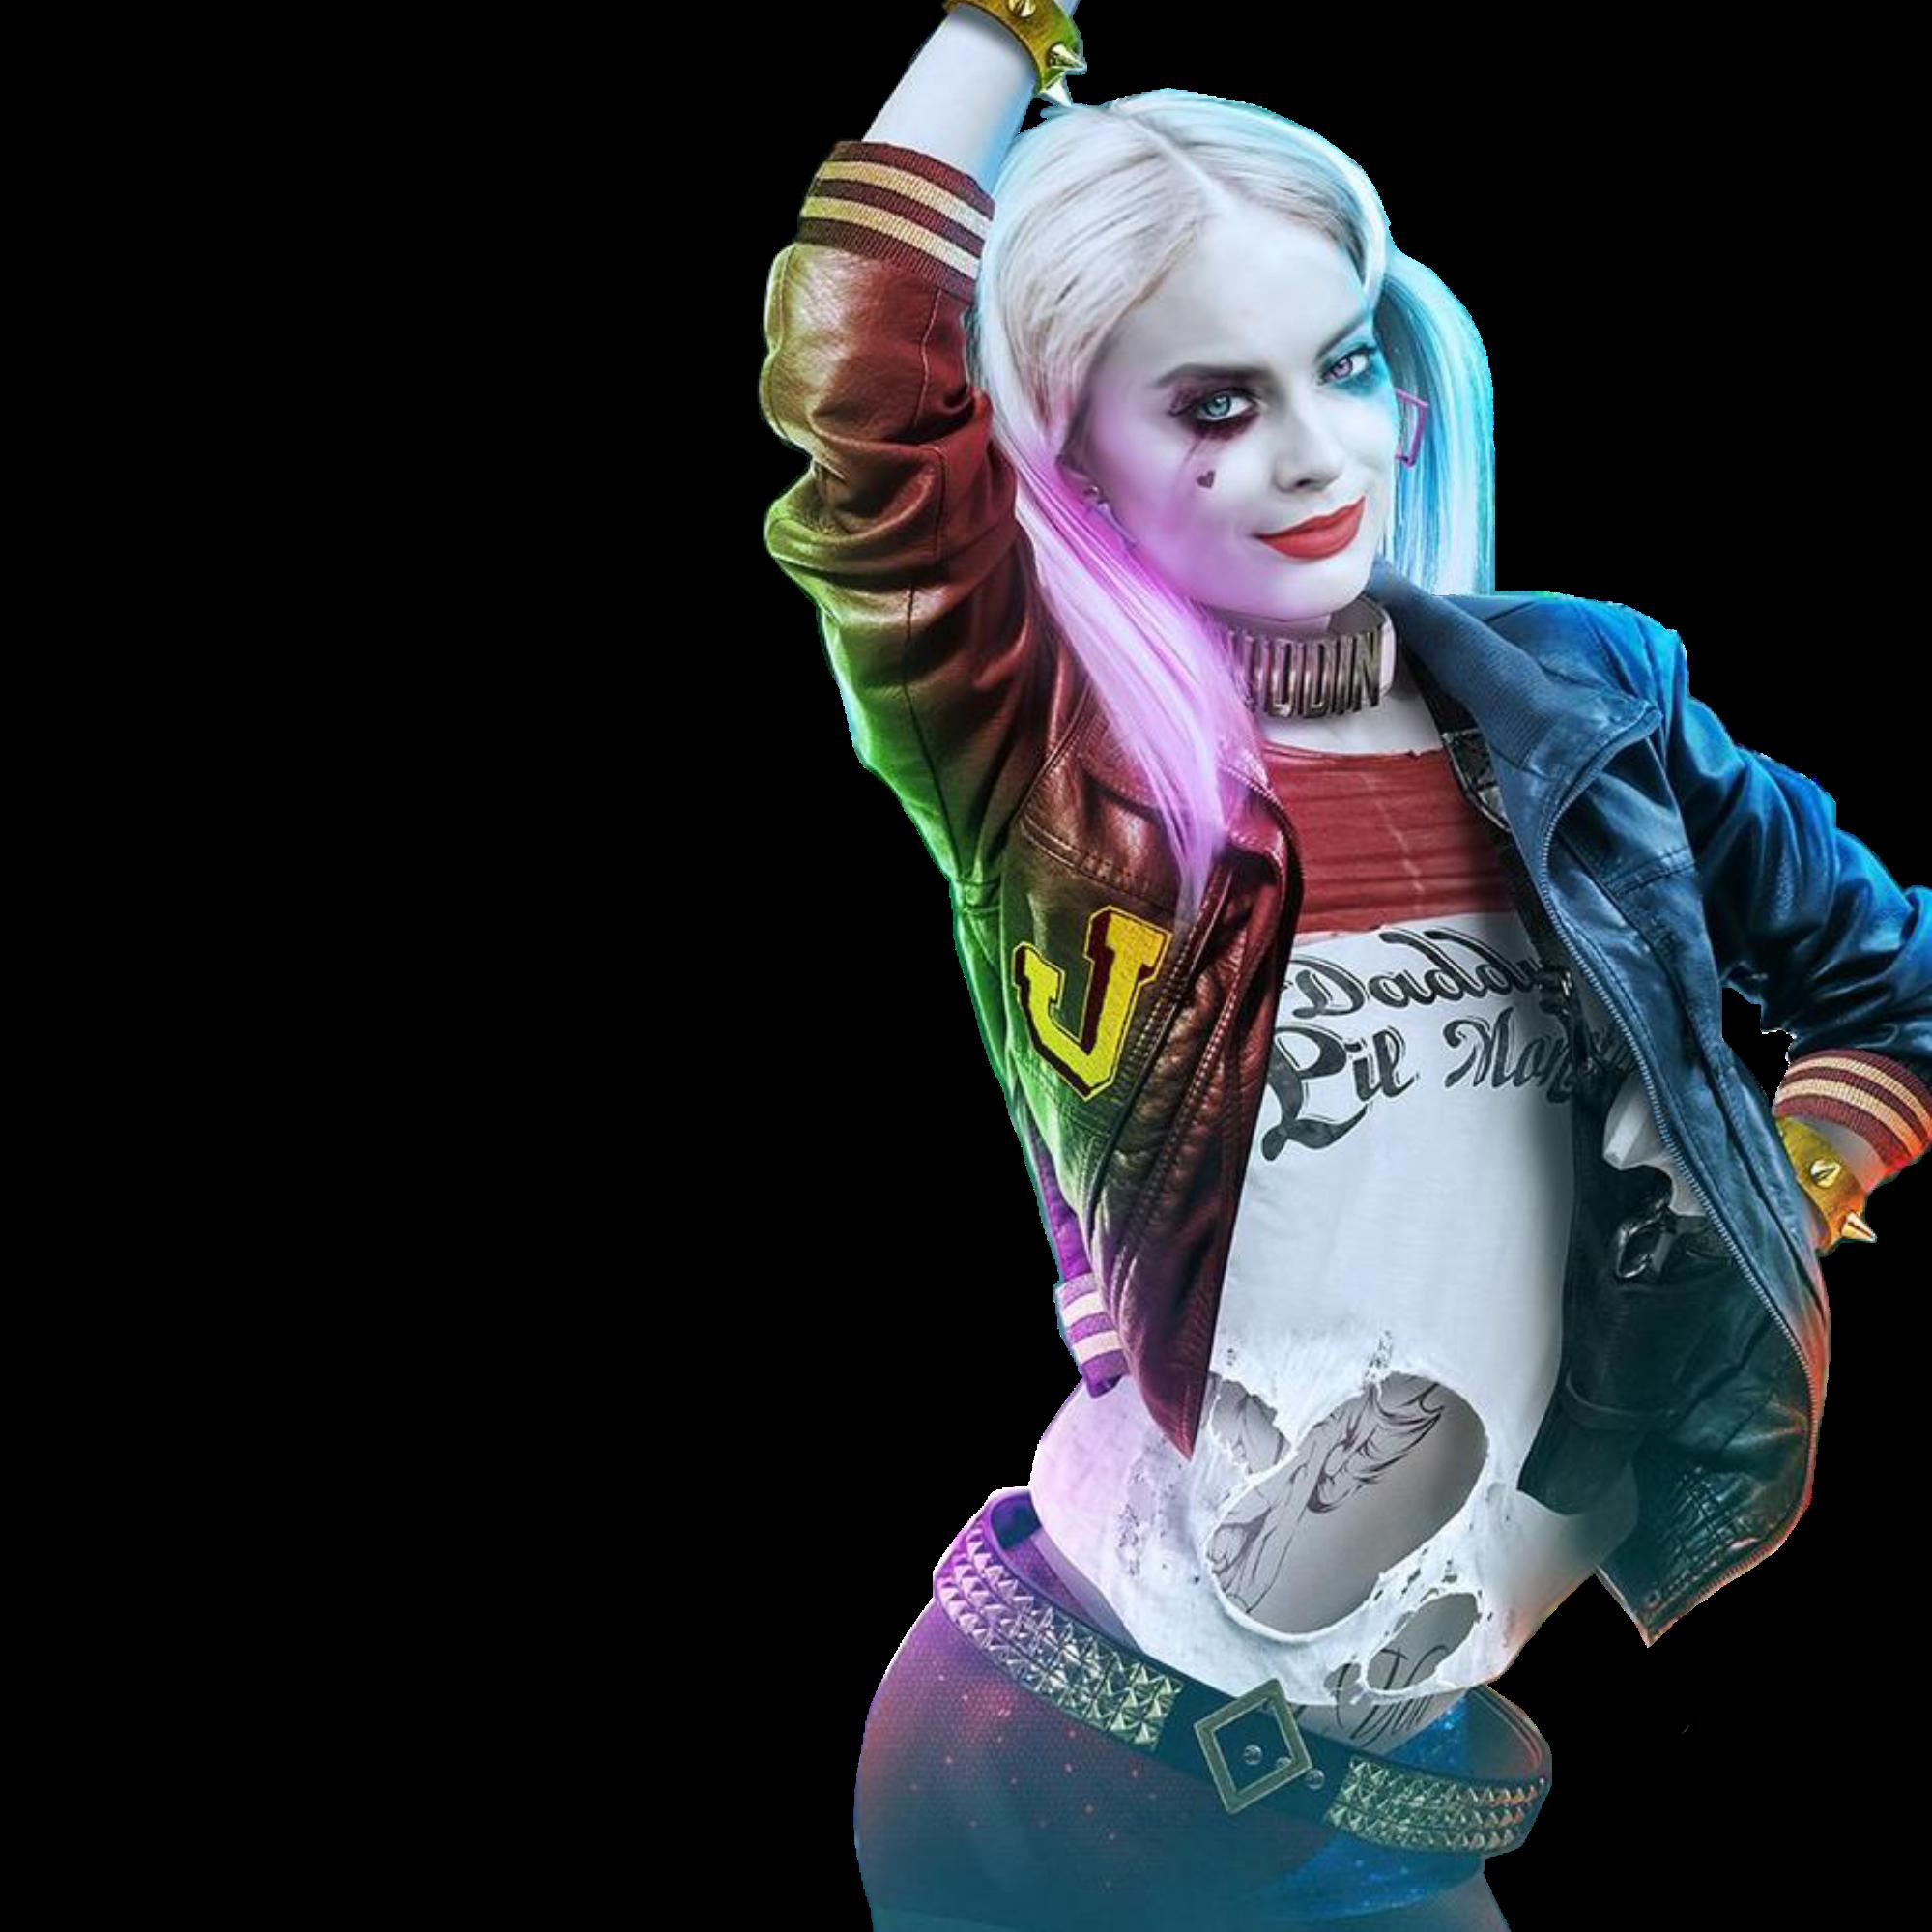 Harley Quinn - Transparent by Asthonx1 Harley Quinn - Transparent by  Asthonx1 - Harley Quinn HD PNG